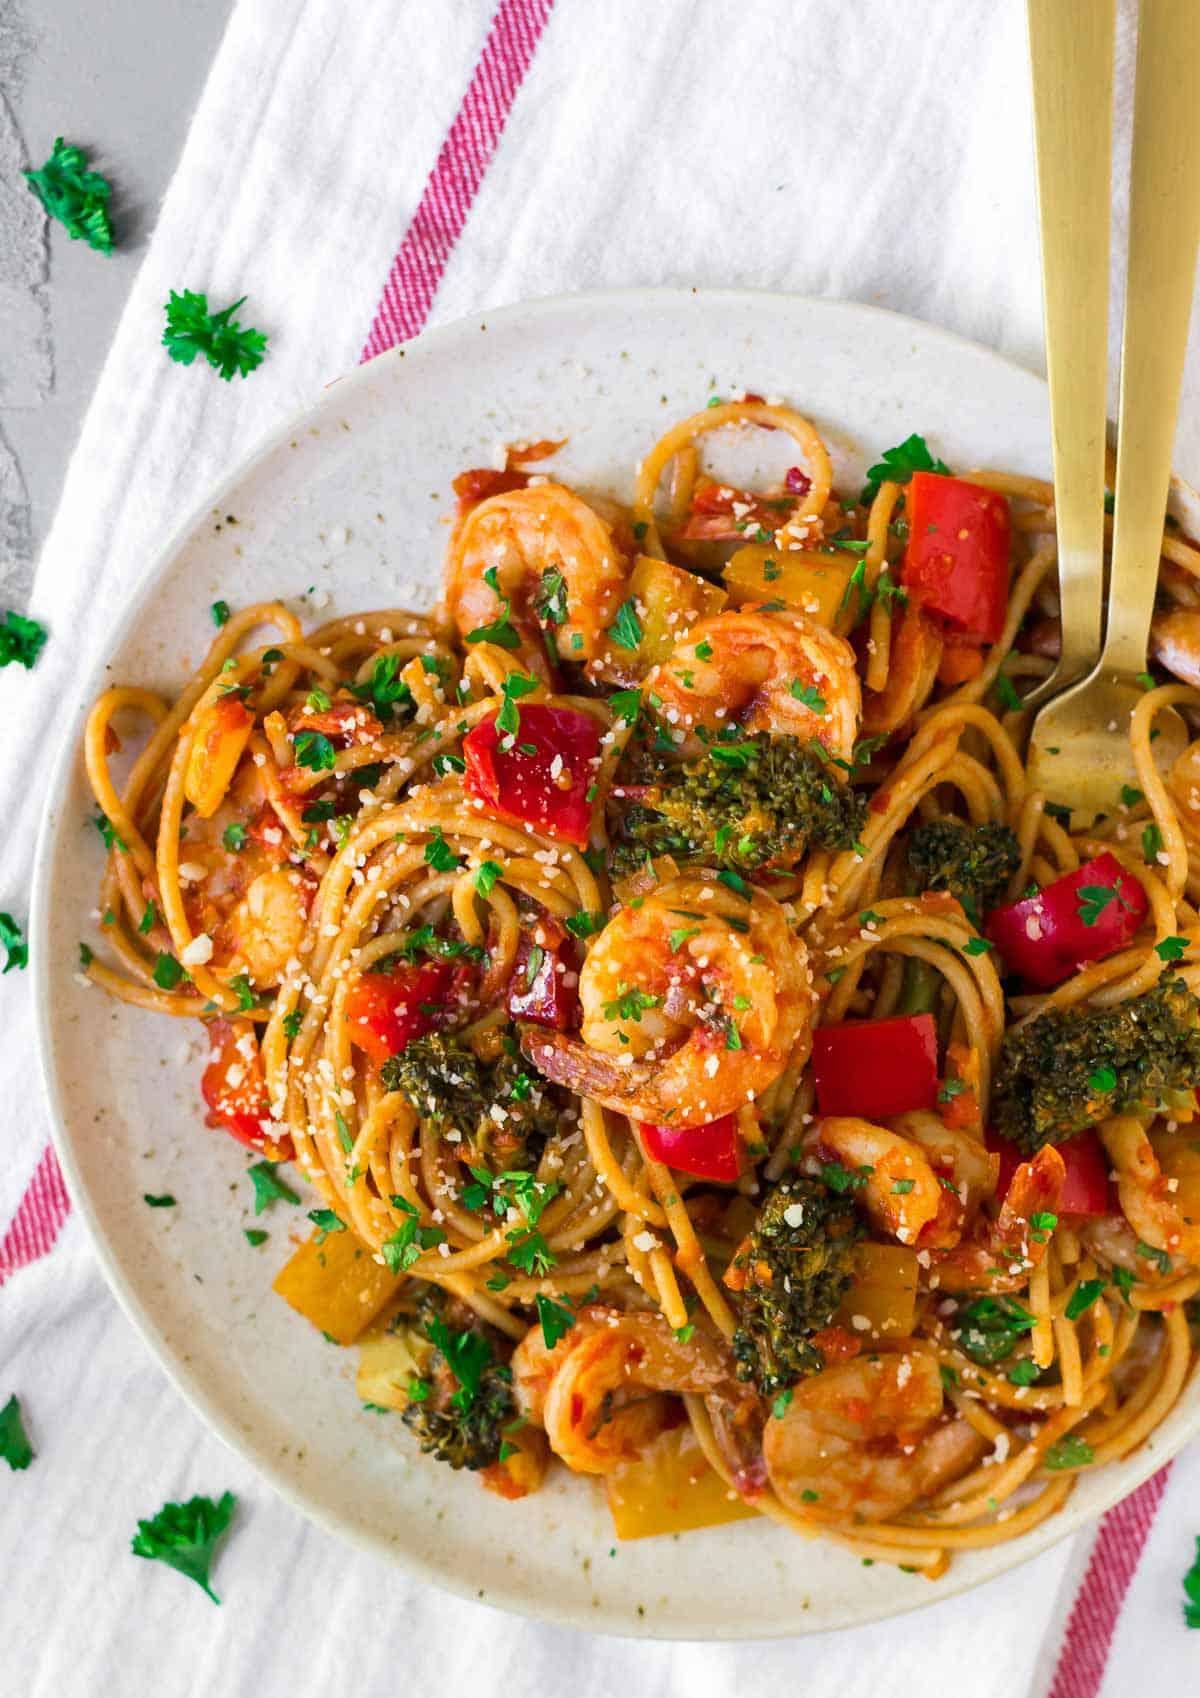 Spicy Shrimp Pasta Creamy Spgahetti Recipe Wellplated Com